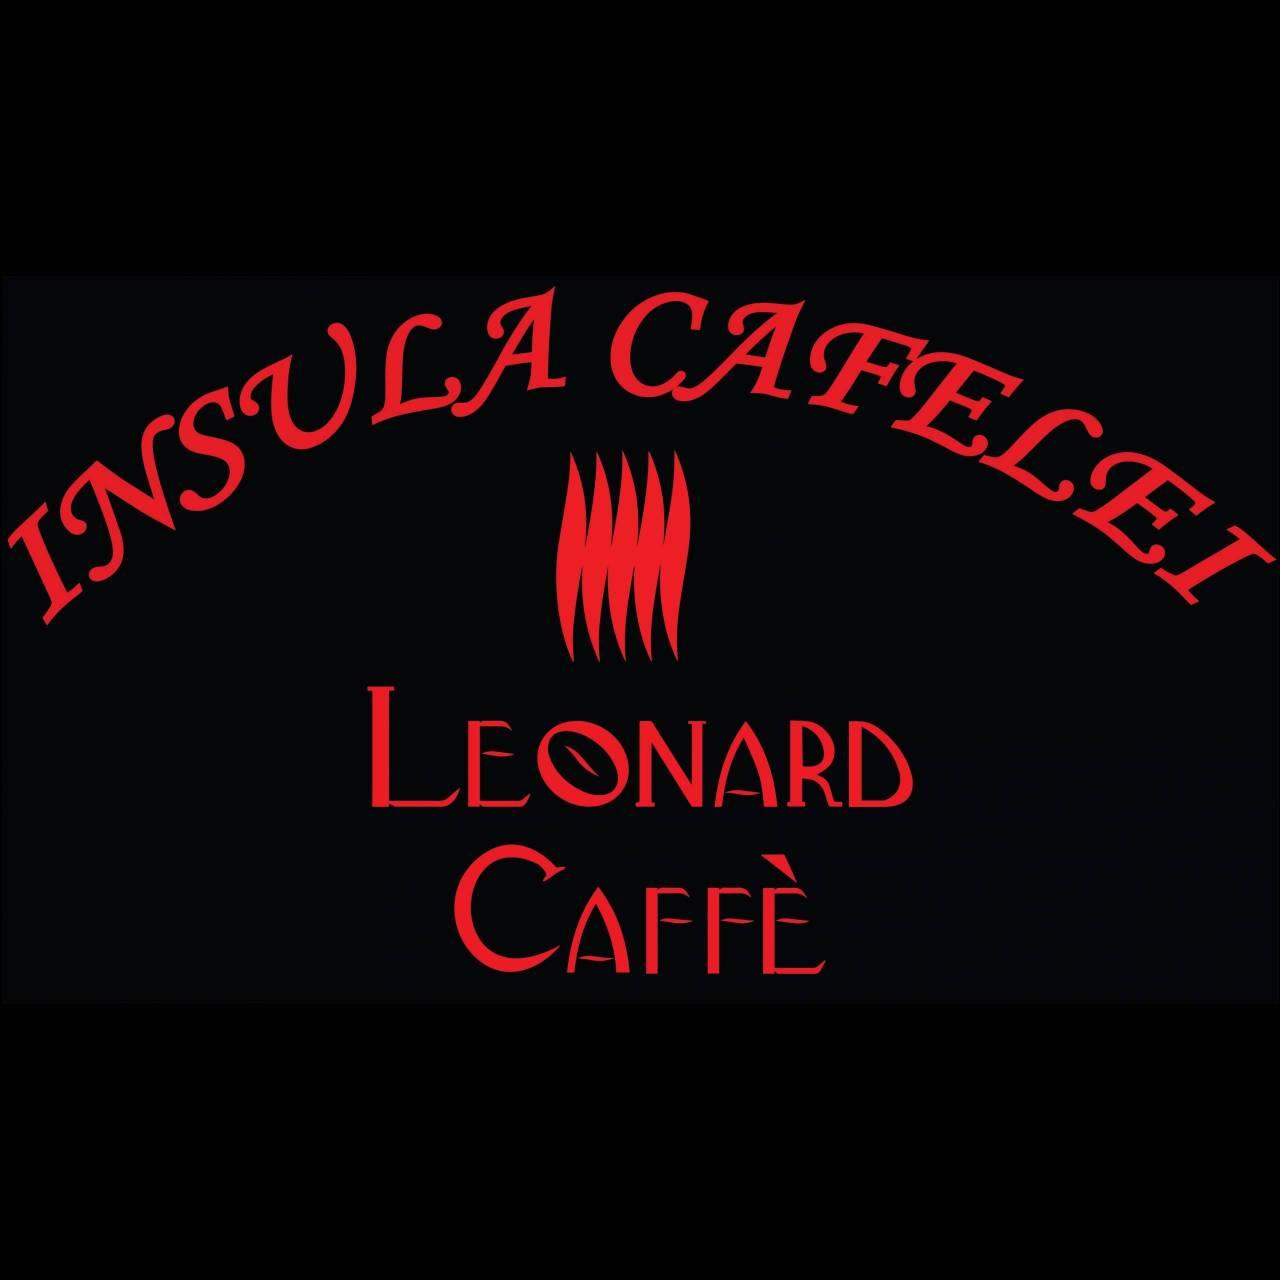 Brandurile prezente in DambvitaMall 20-10-27 - Insula Cafelei Leonard Caffe